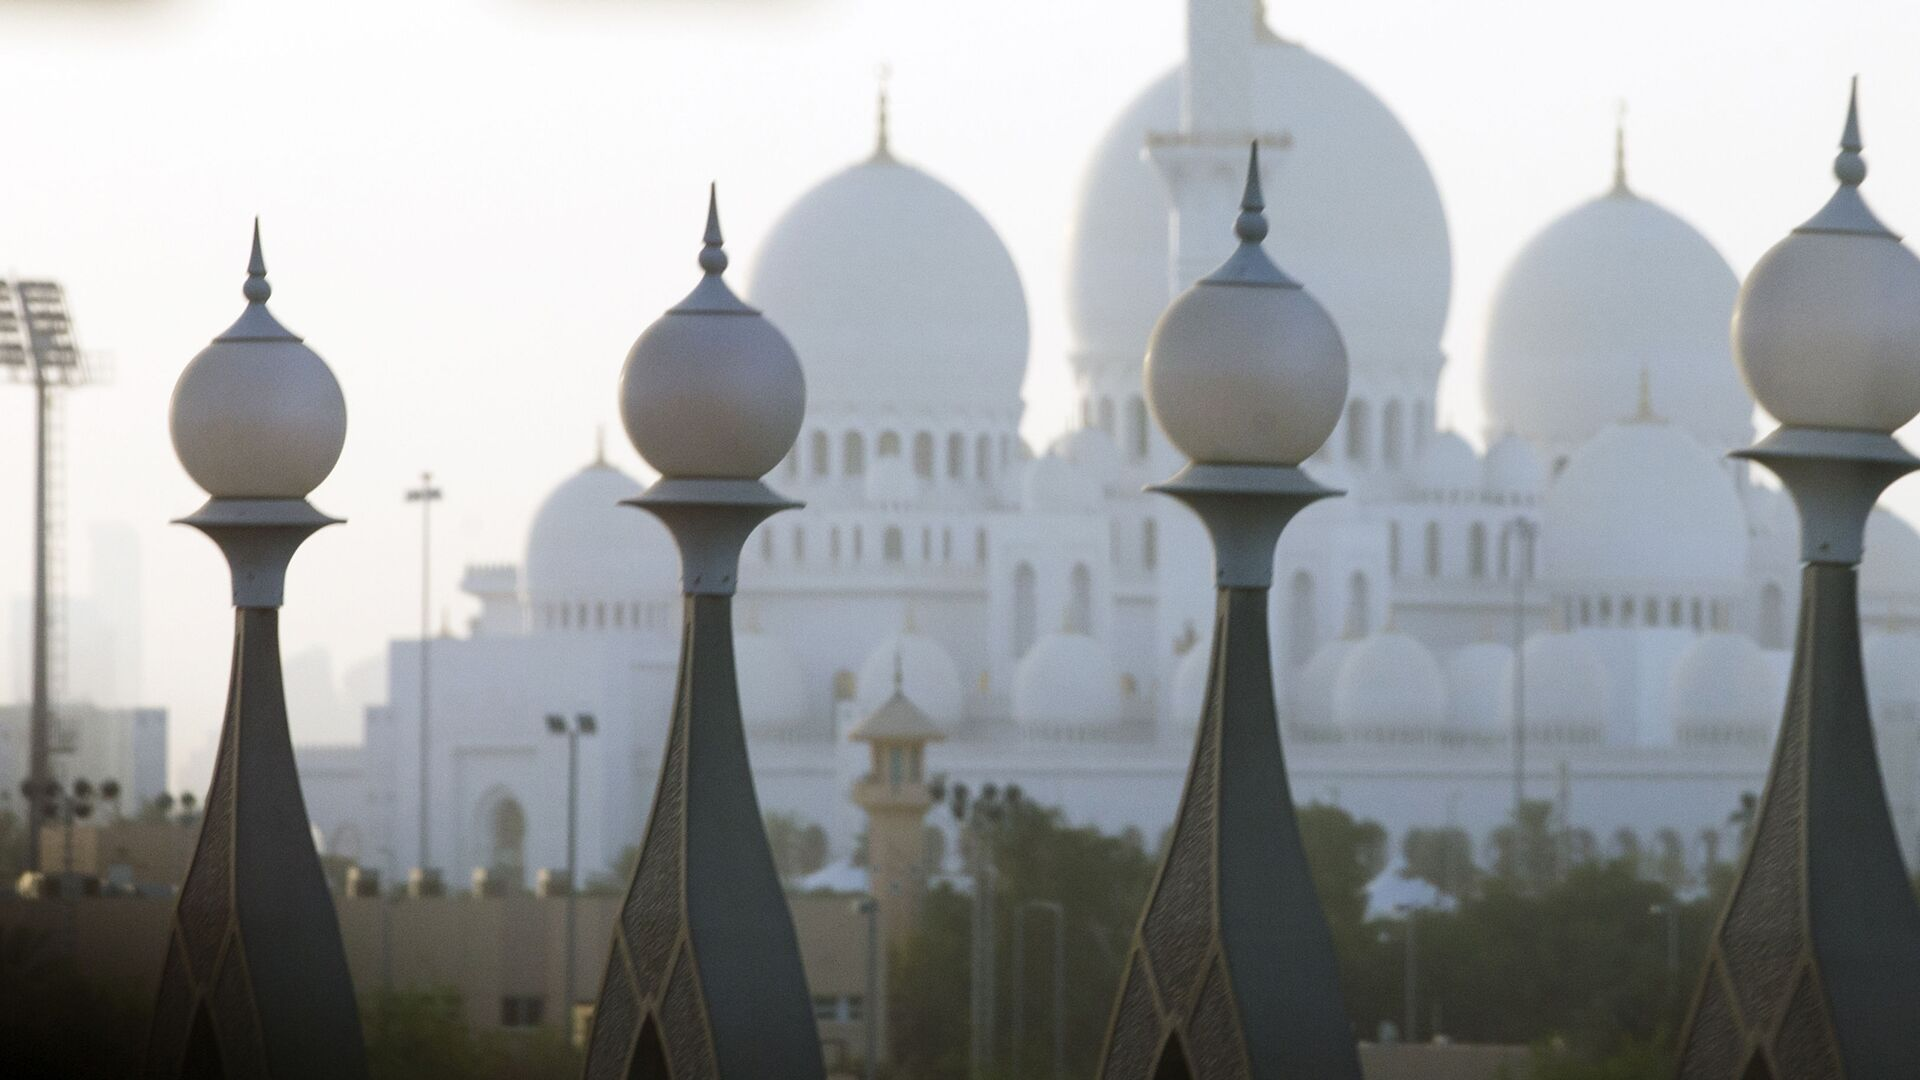 Abu Dhabi, capitale degli Emirati Arabi Uniti - Sputnik Italia, 1920, 27.06.2021